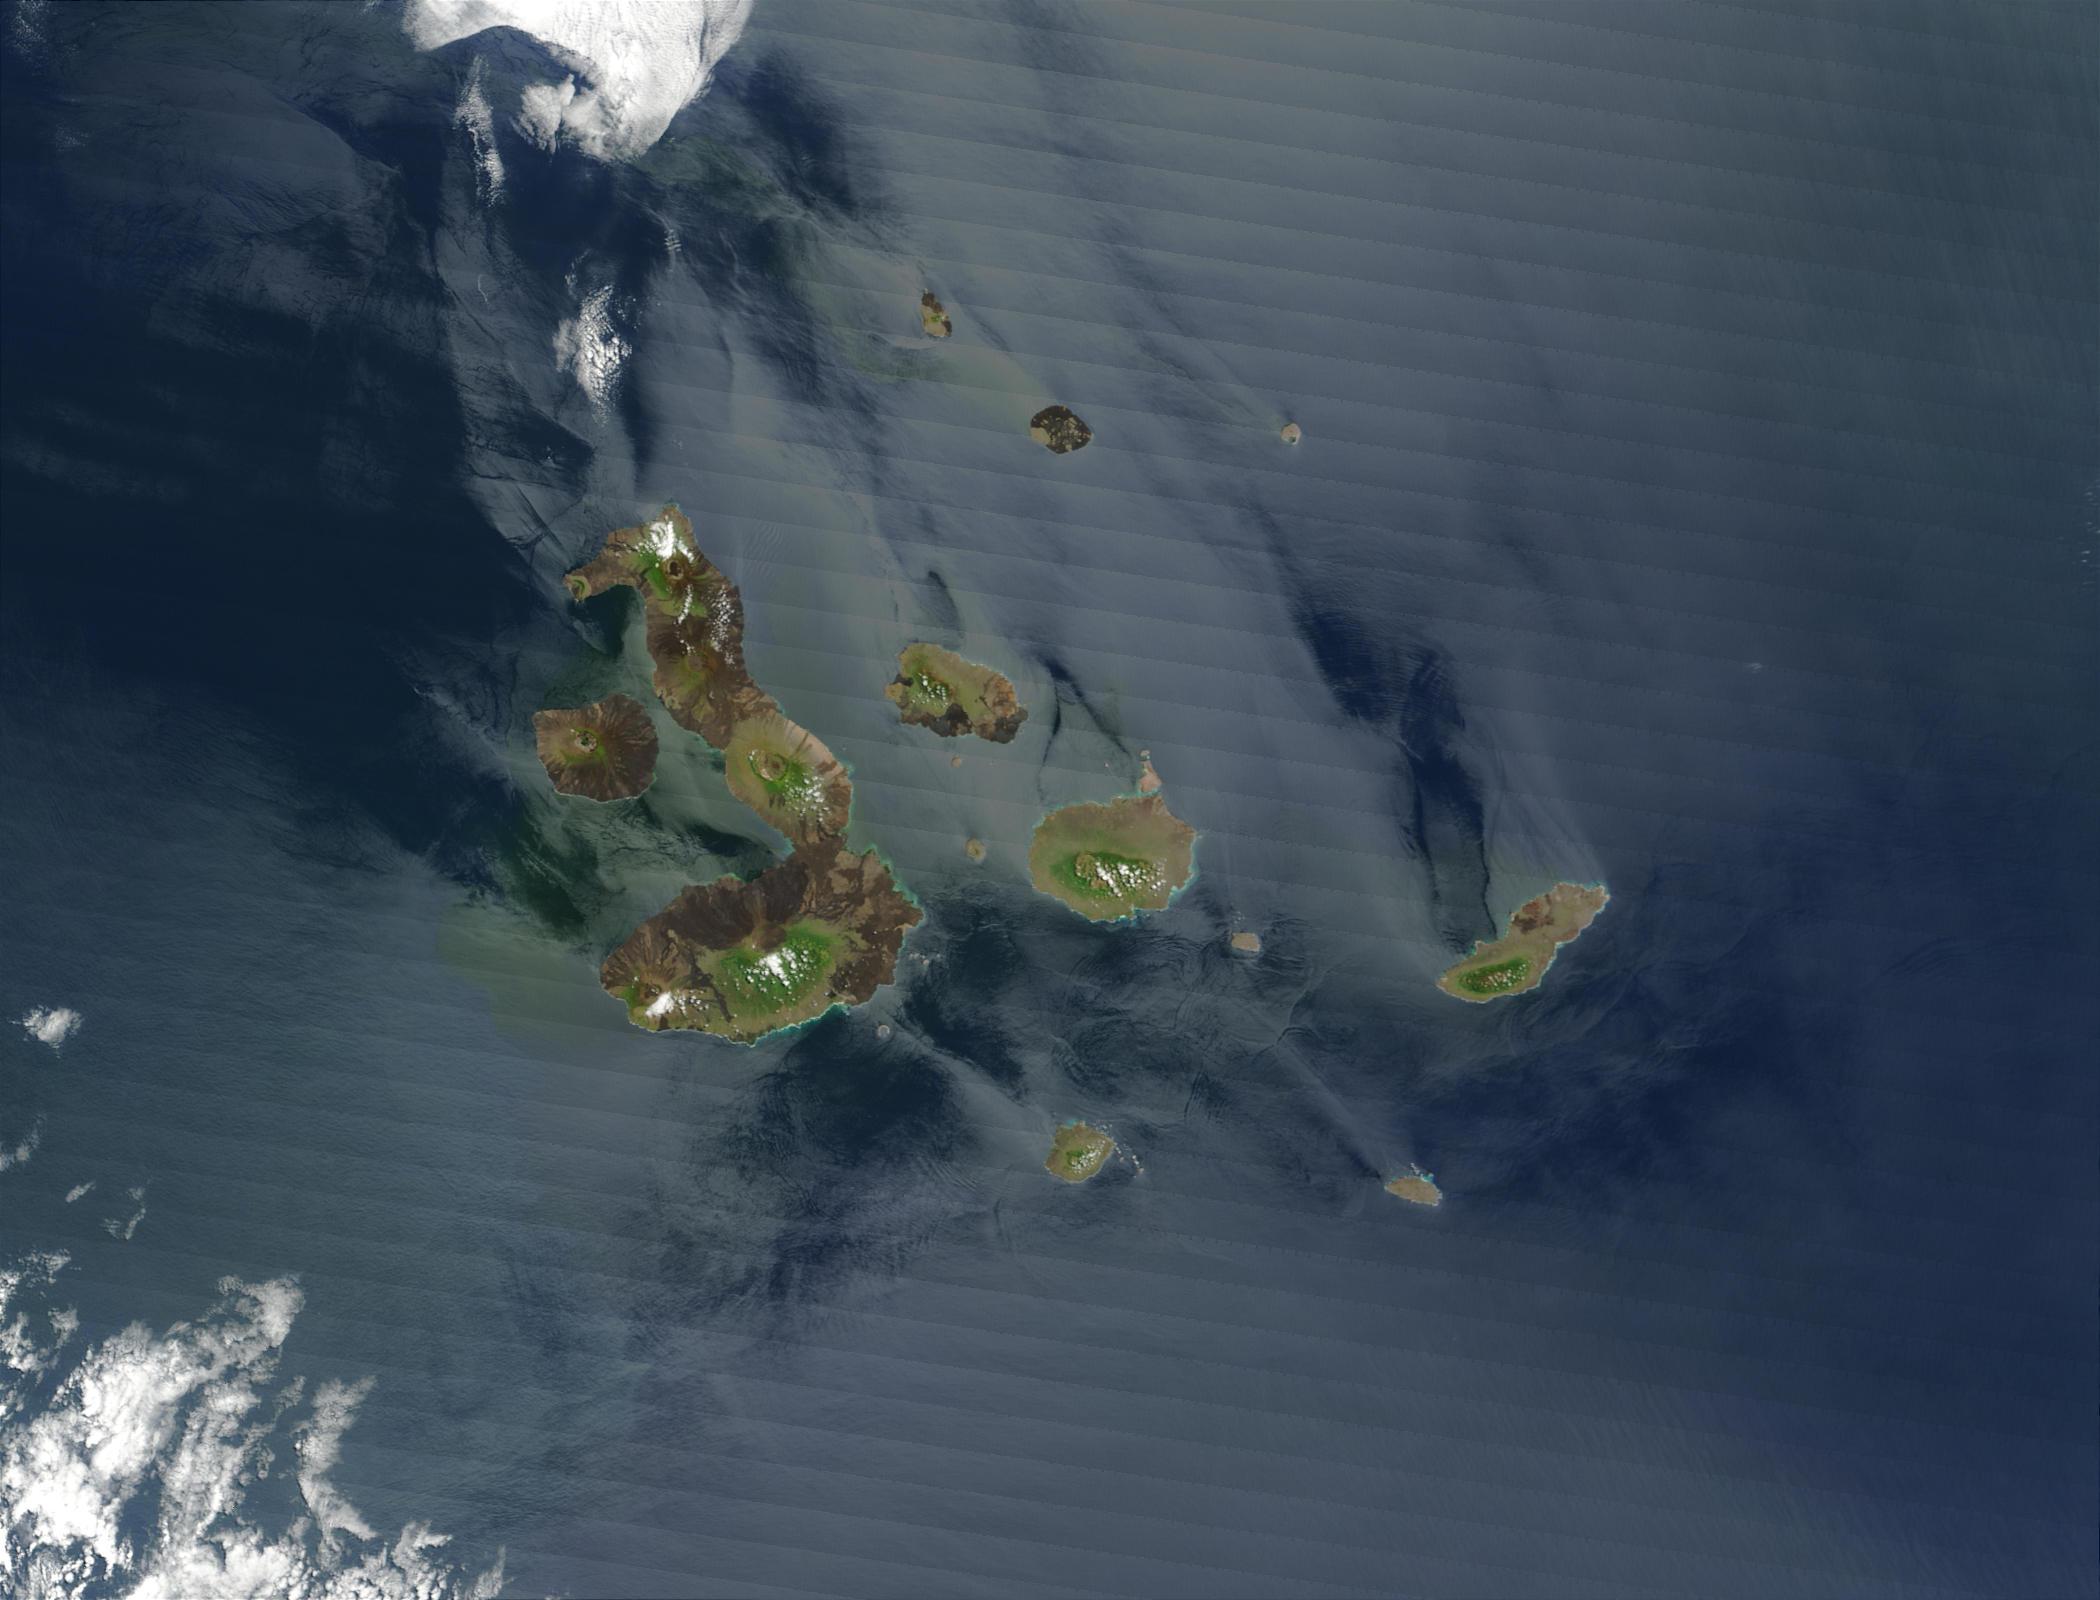 Galapagos Islands, Pacific Ocean